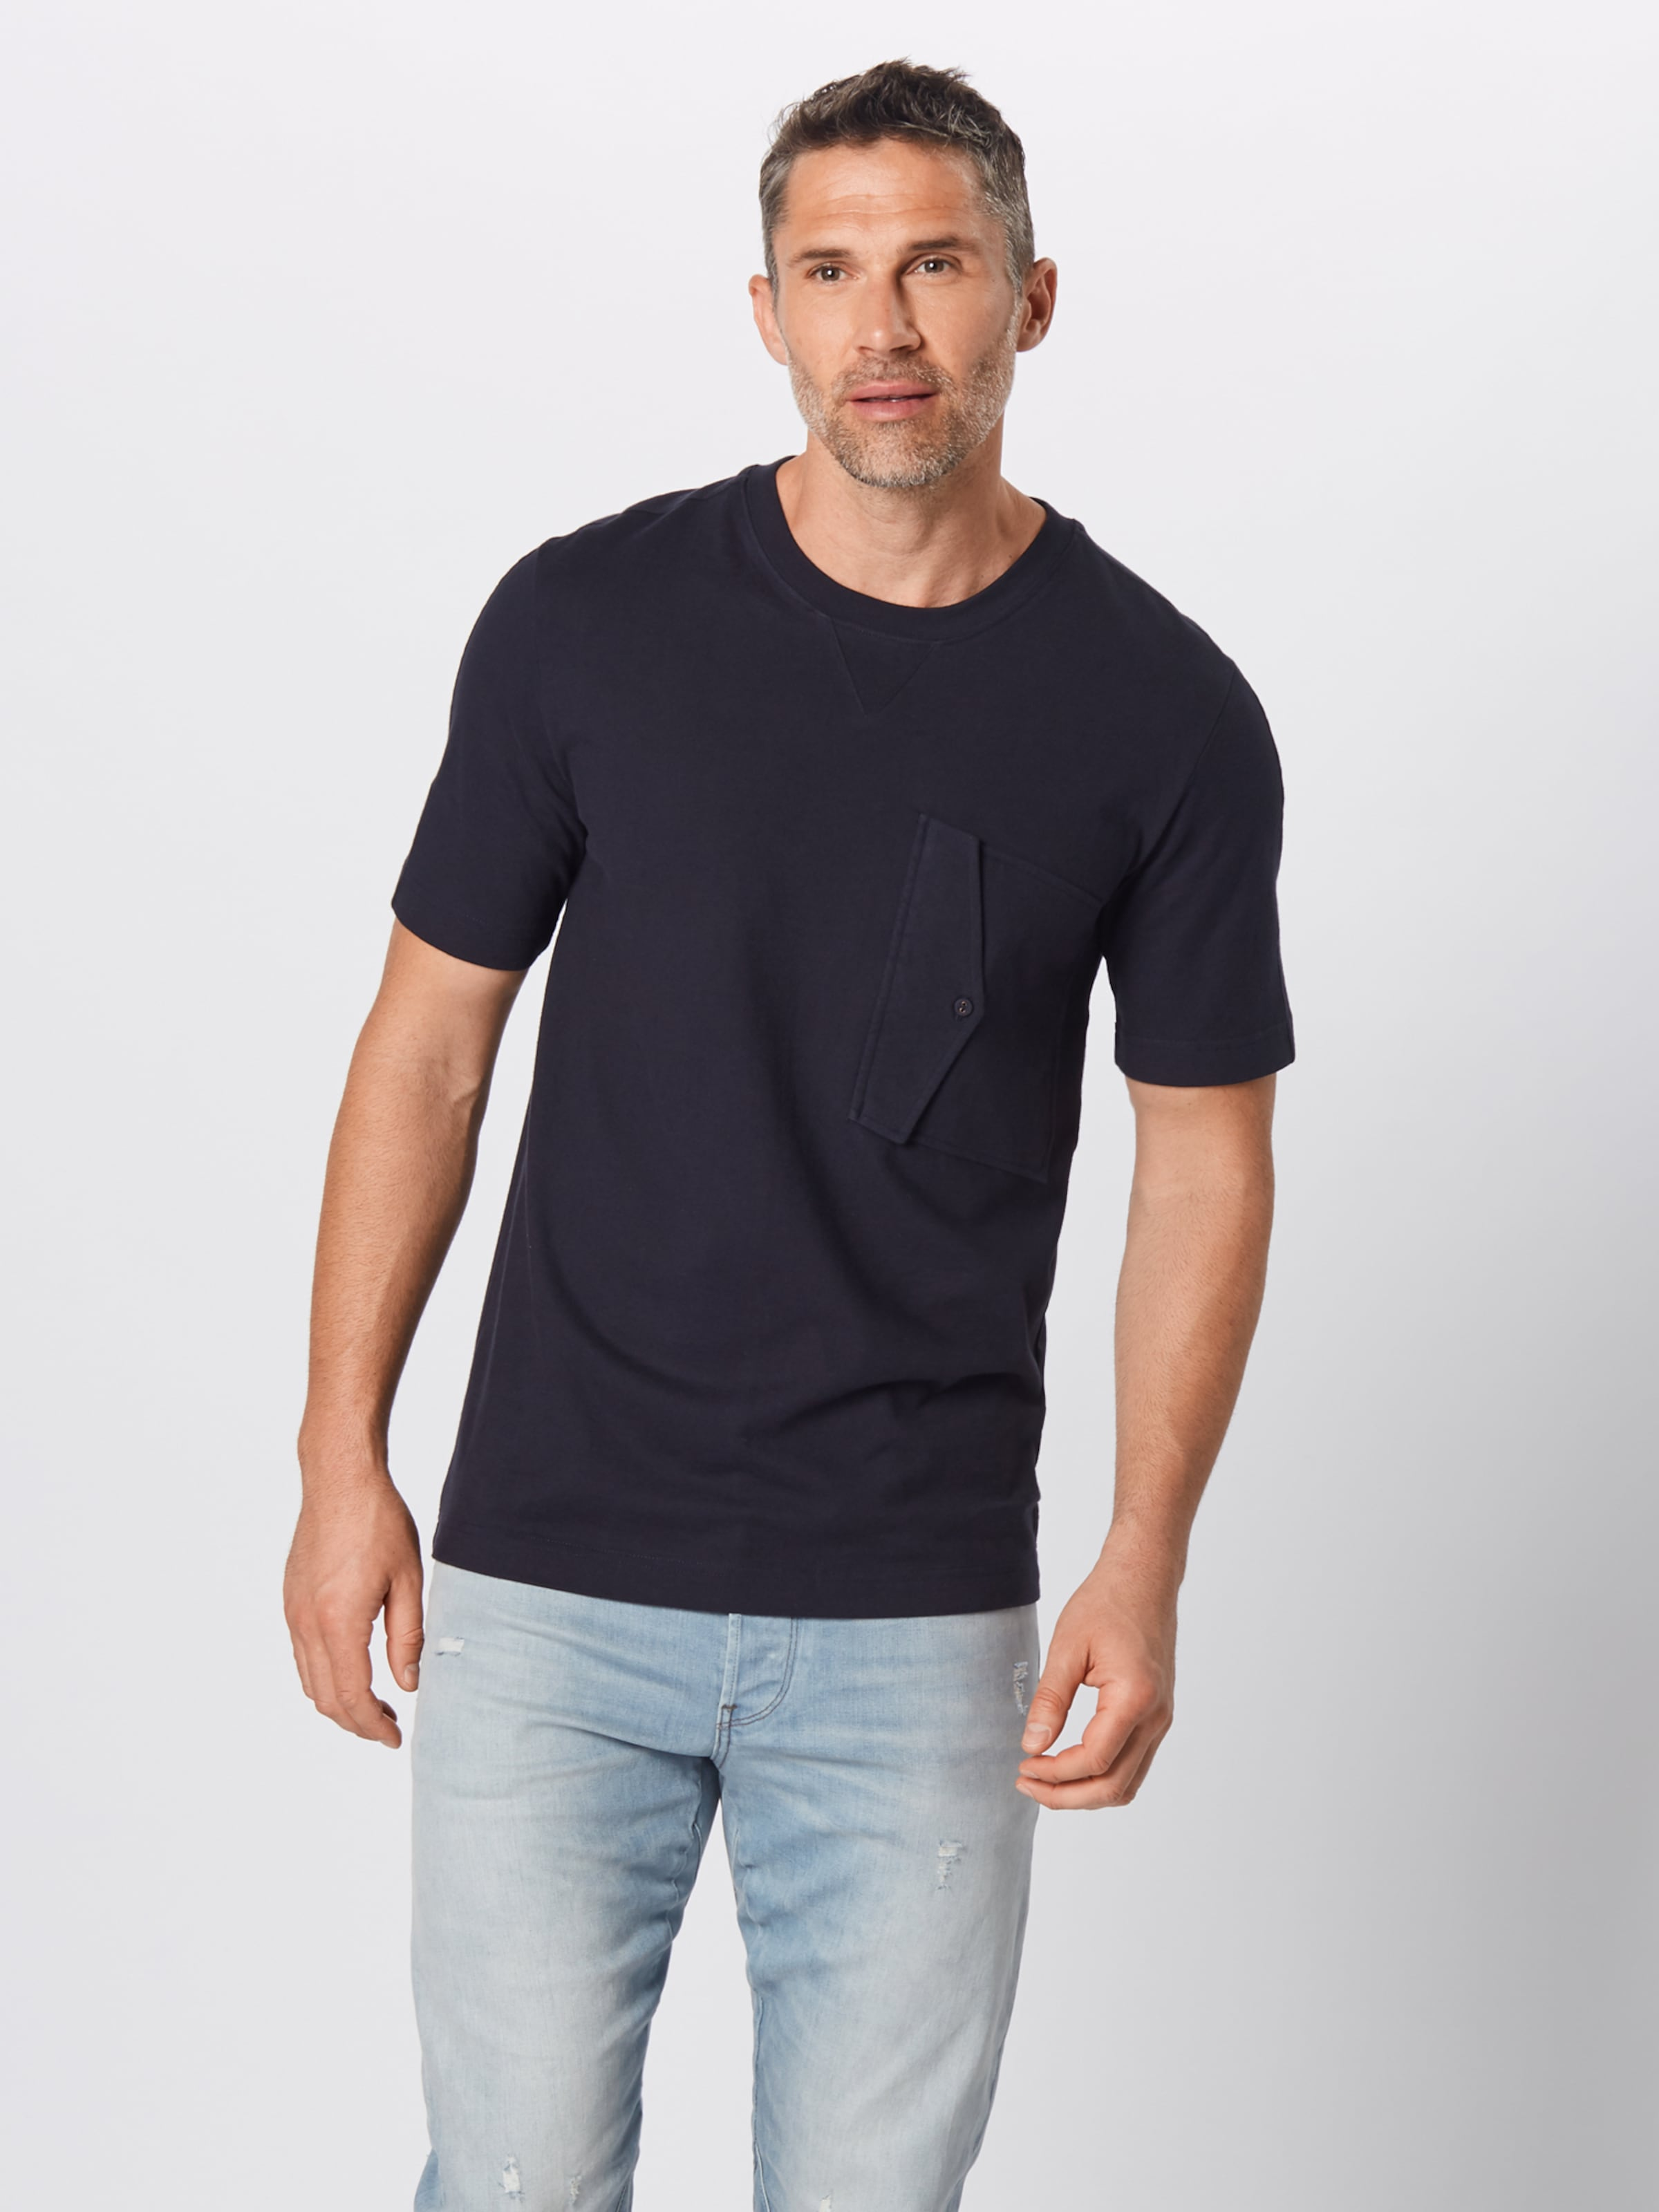 Ss' Dunkelblau Shirt Pocket T Raw 'korpaz R In G star 34q5RjAL